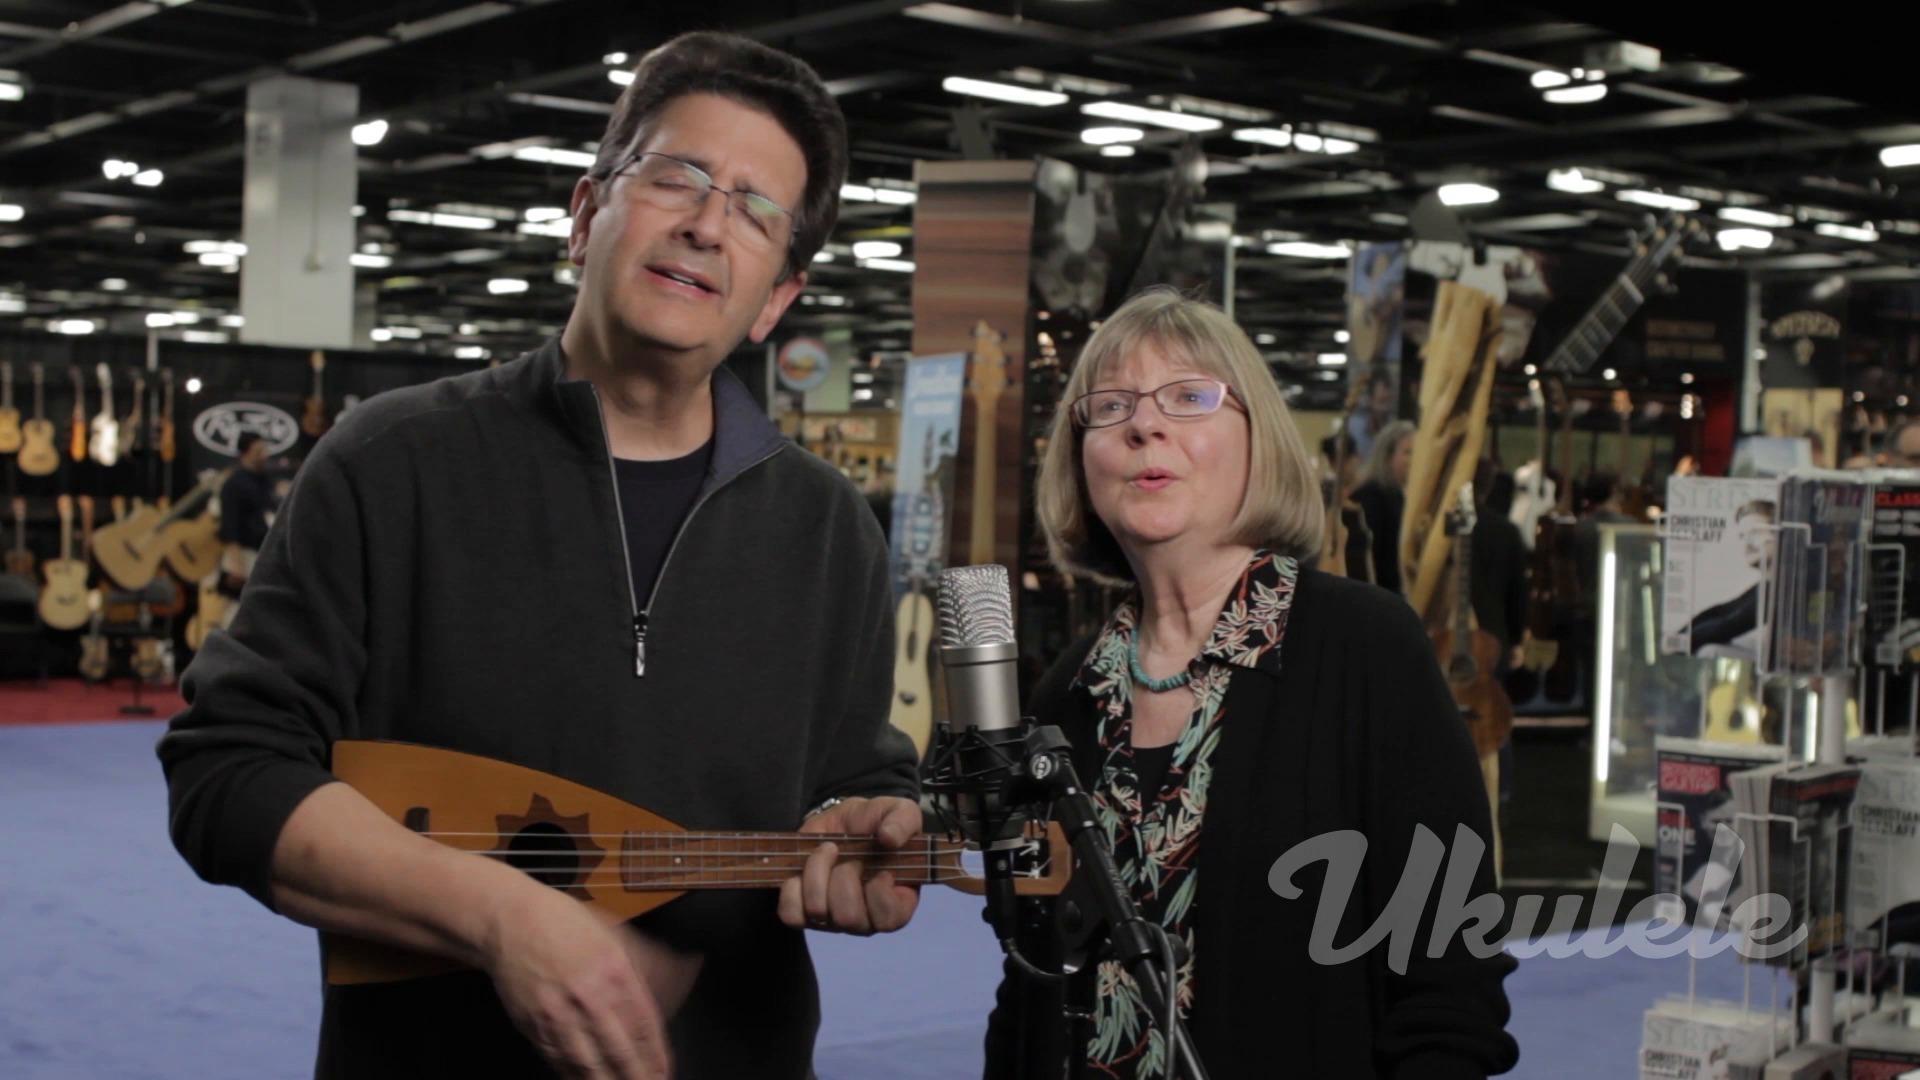 Liz and Jim Beloff Ukulele Session Winter NAMM 2016